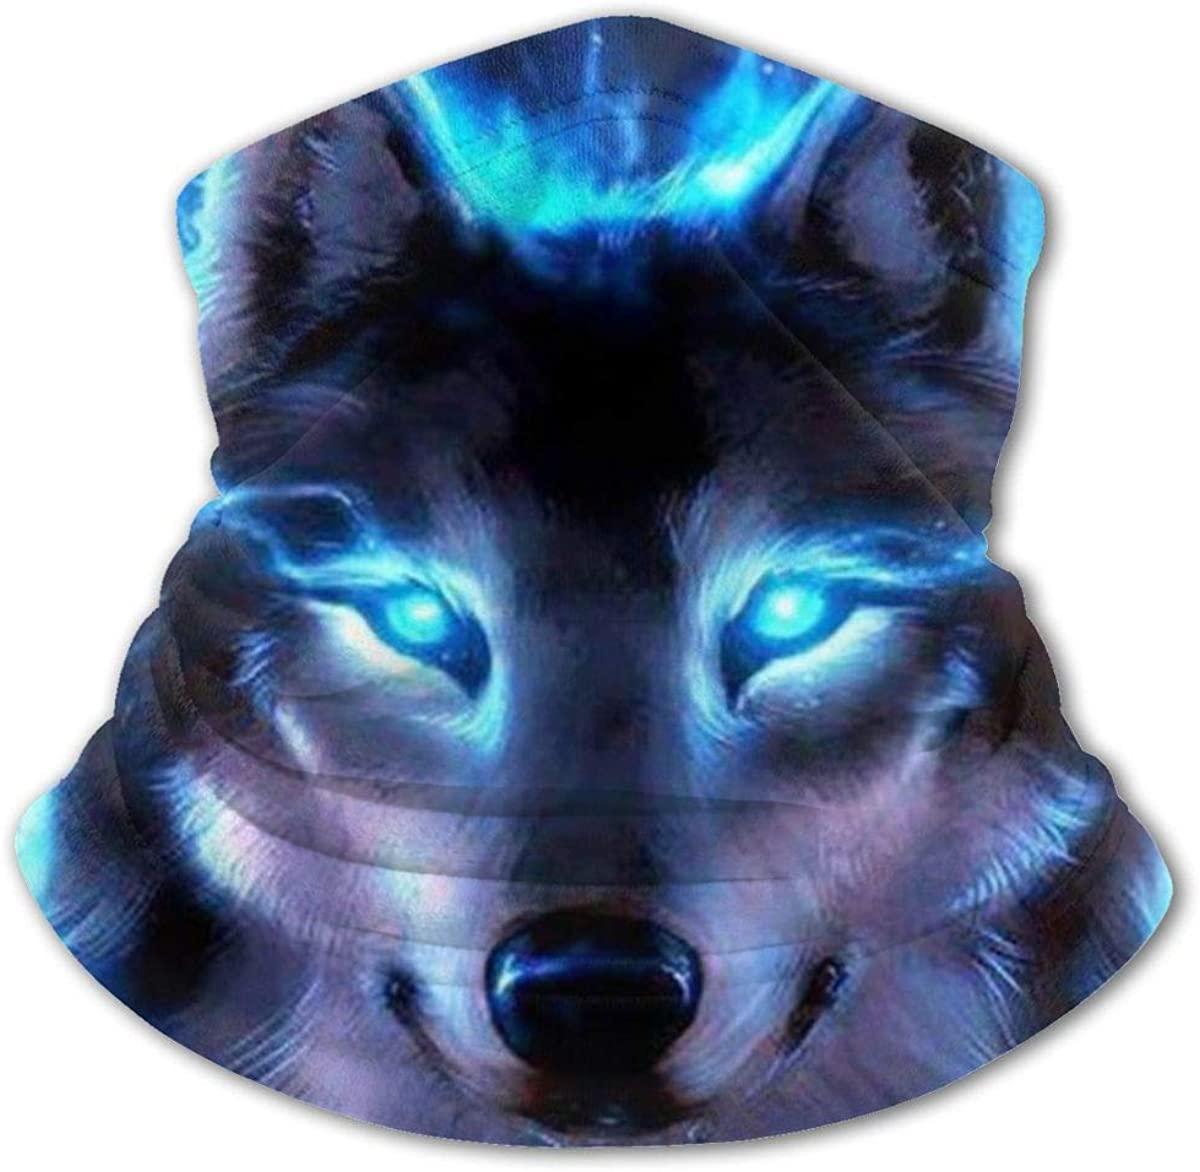 Fluorescence Wolf Headwear For Girls And Boys, Head Wrap, Neck Gaiter, Headband, Tenn Fishing Mask, Magic Scarf, Tube Mask, Face Bandana Mask For Camping Running Cycling